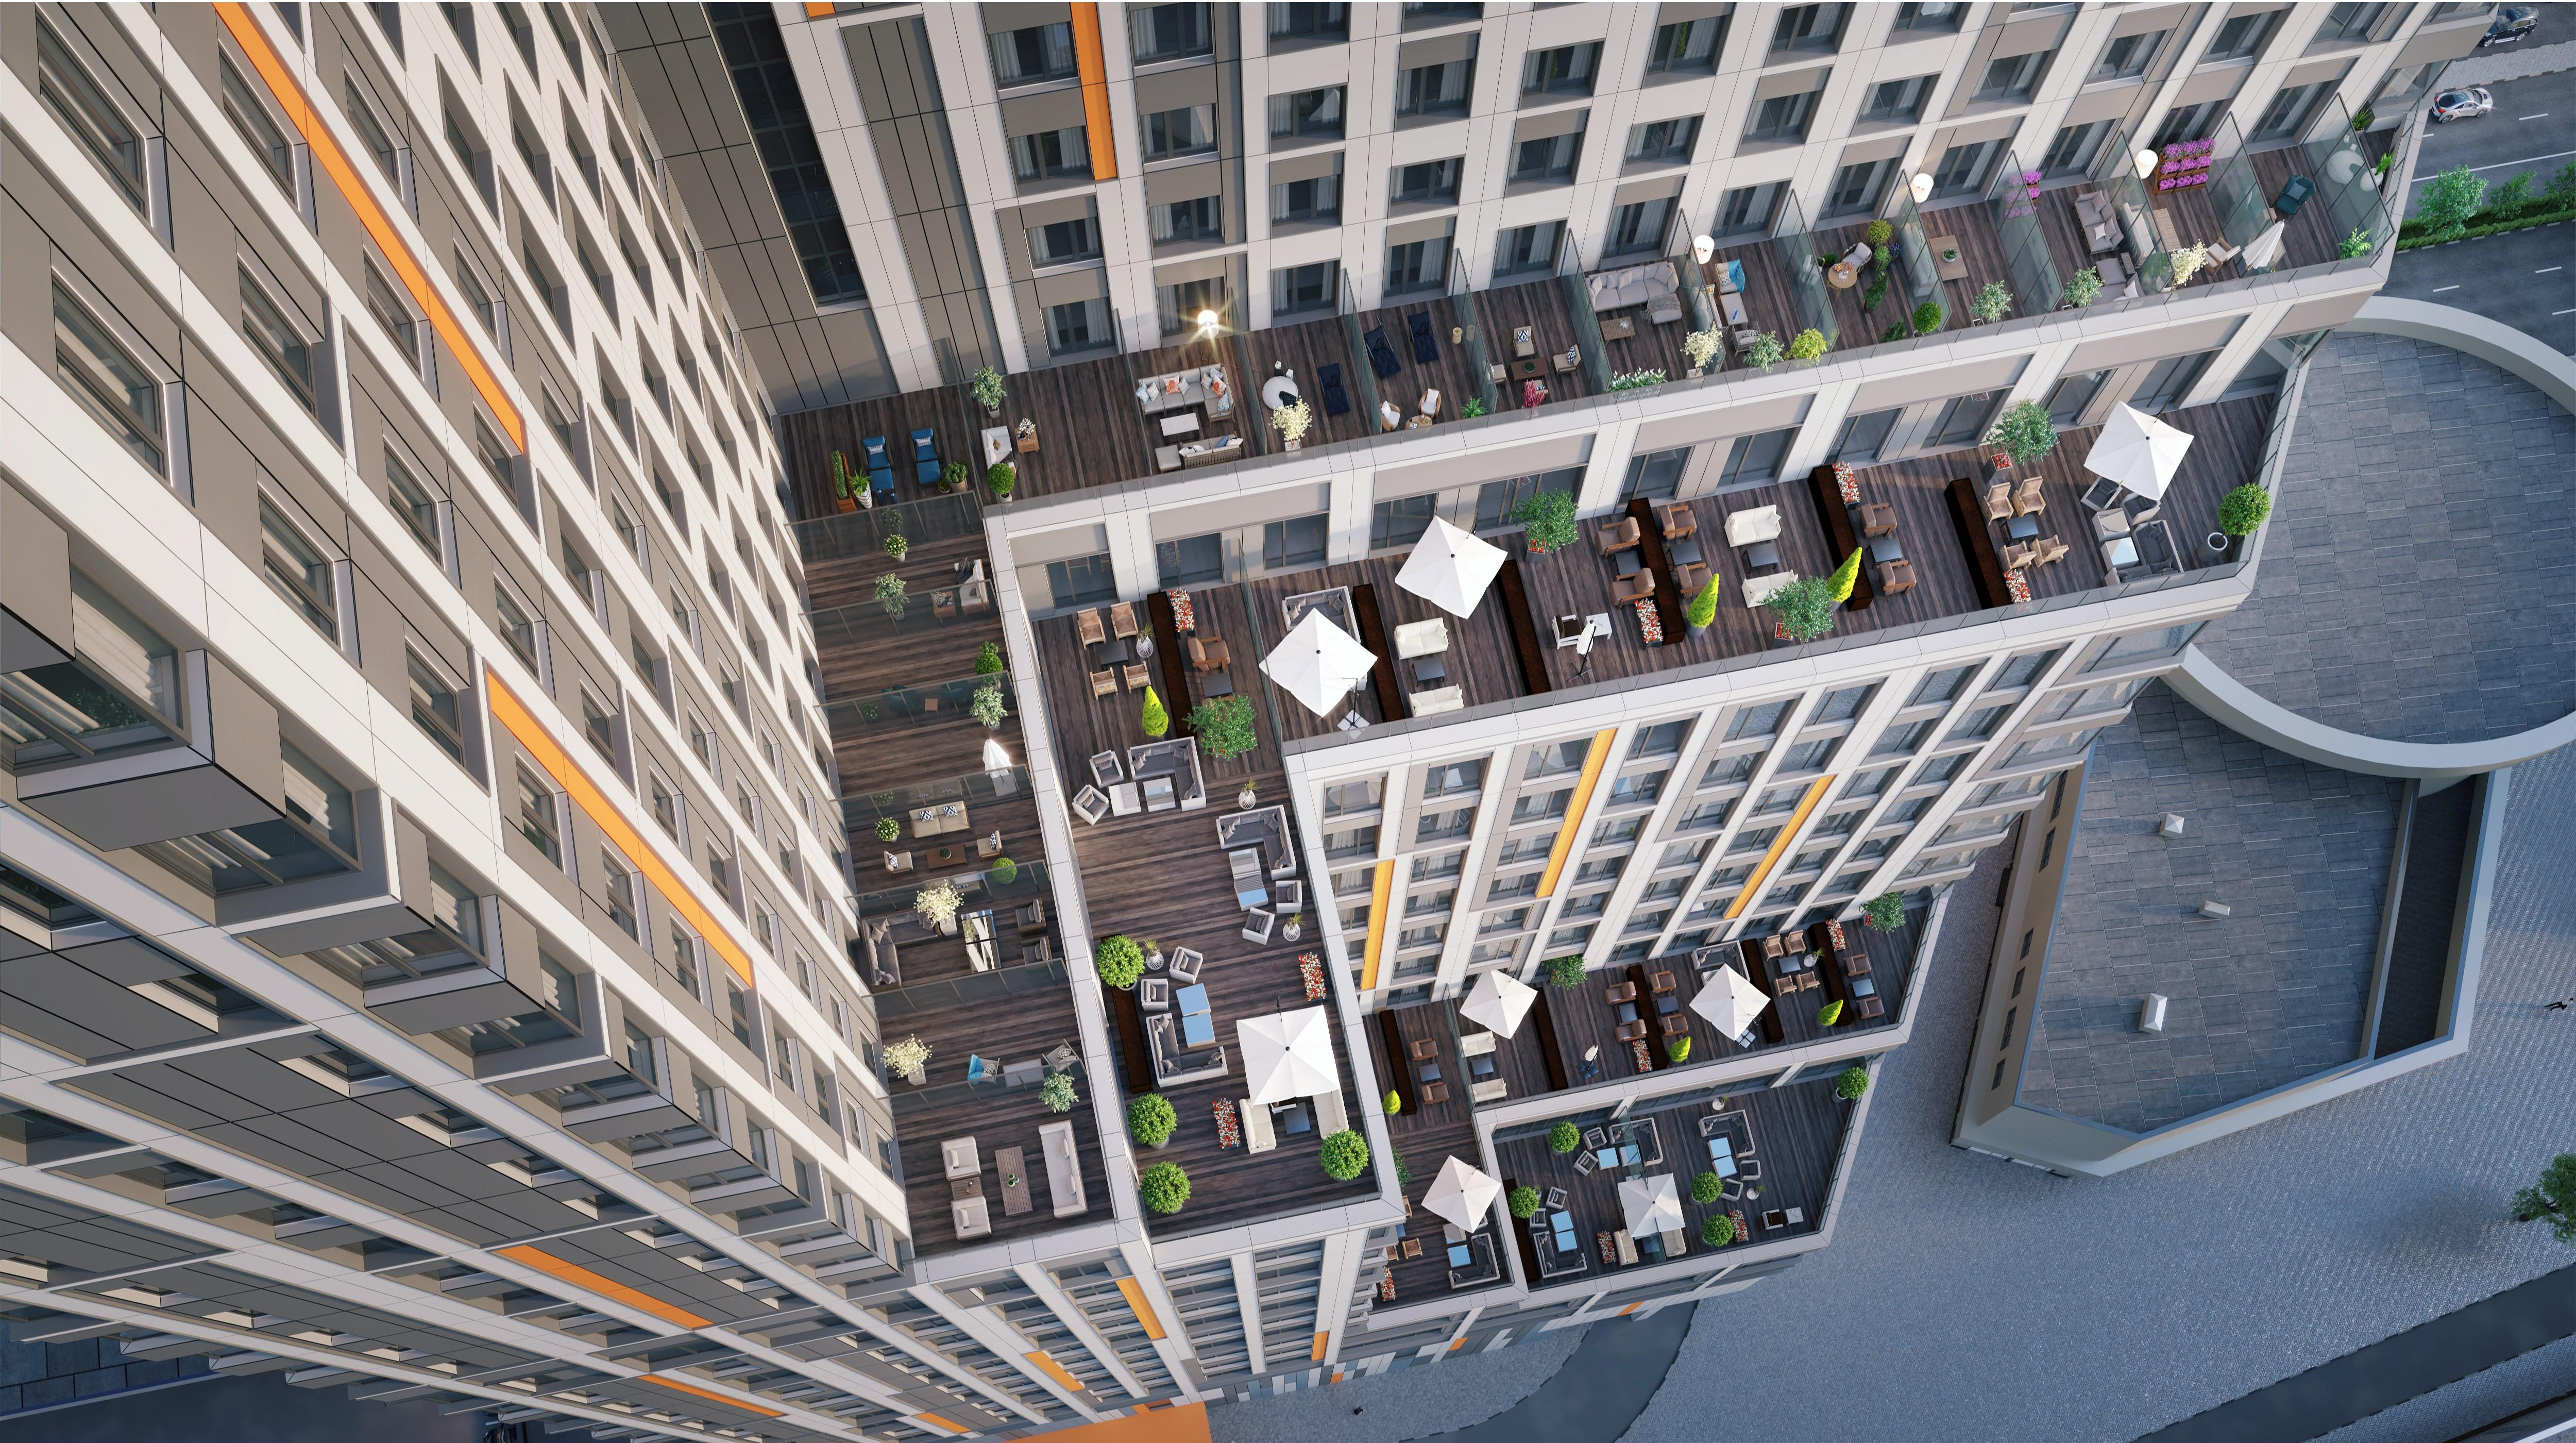 Апартаменты с террасами в МФК Technopark. Визуализация